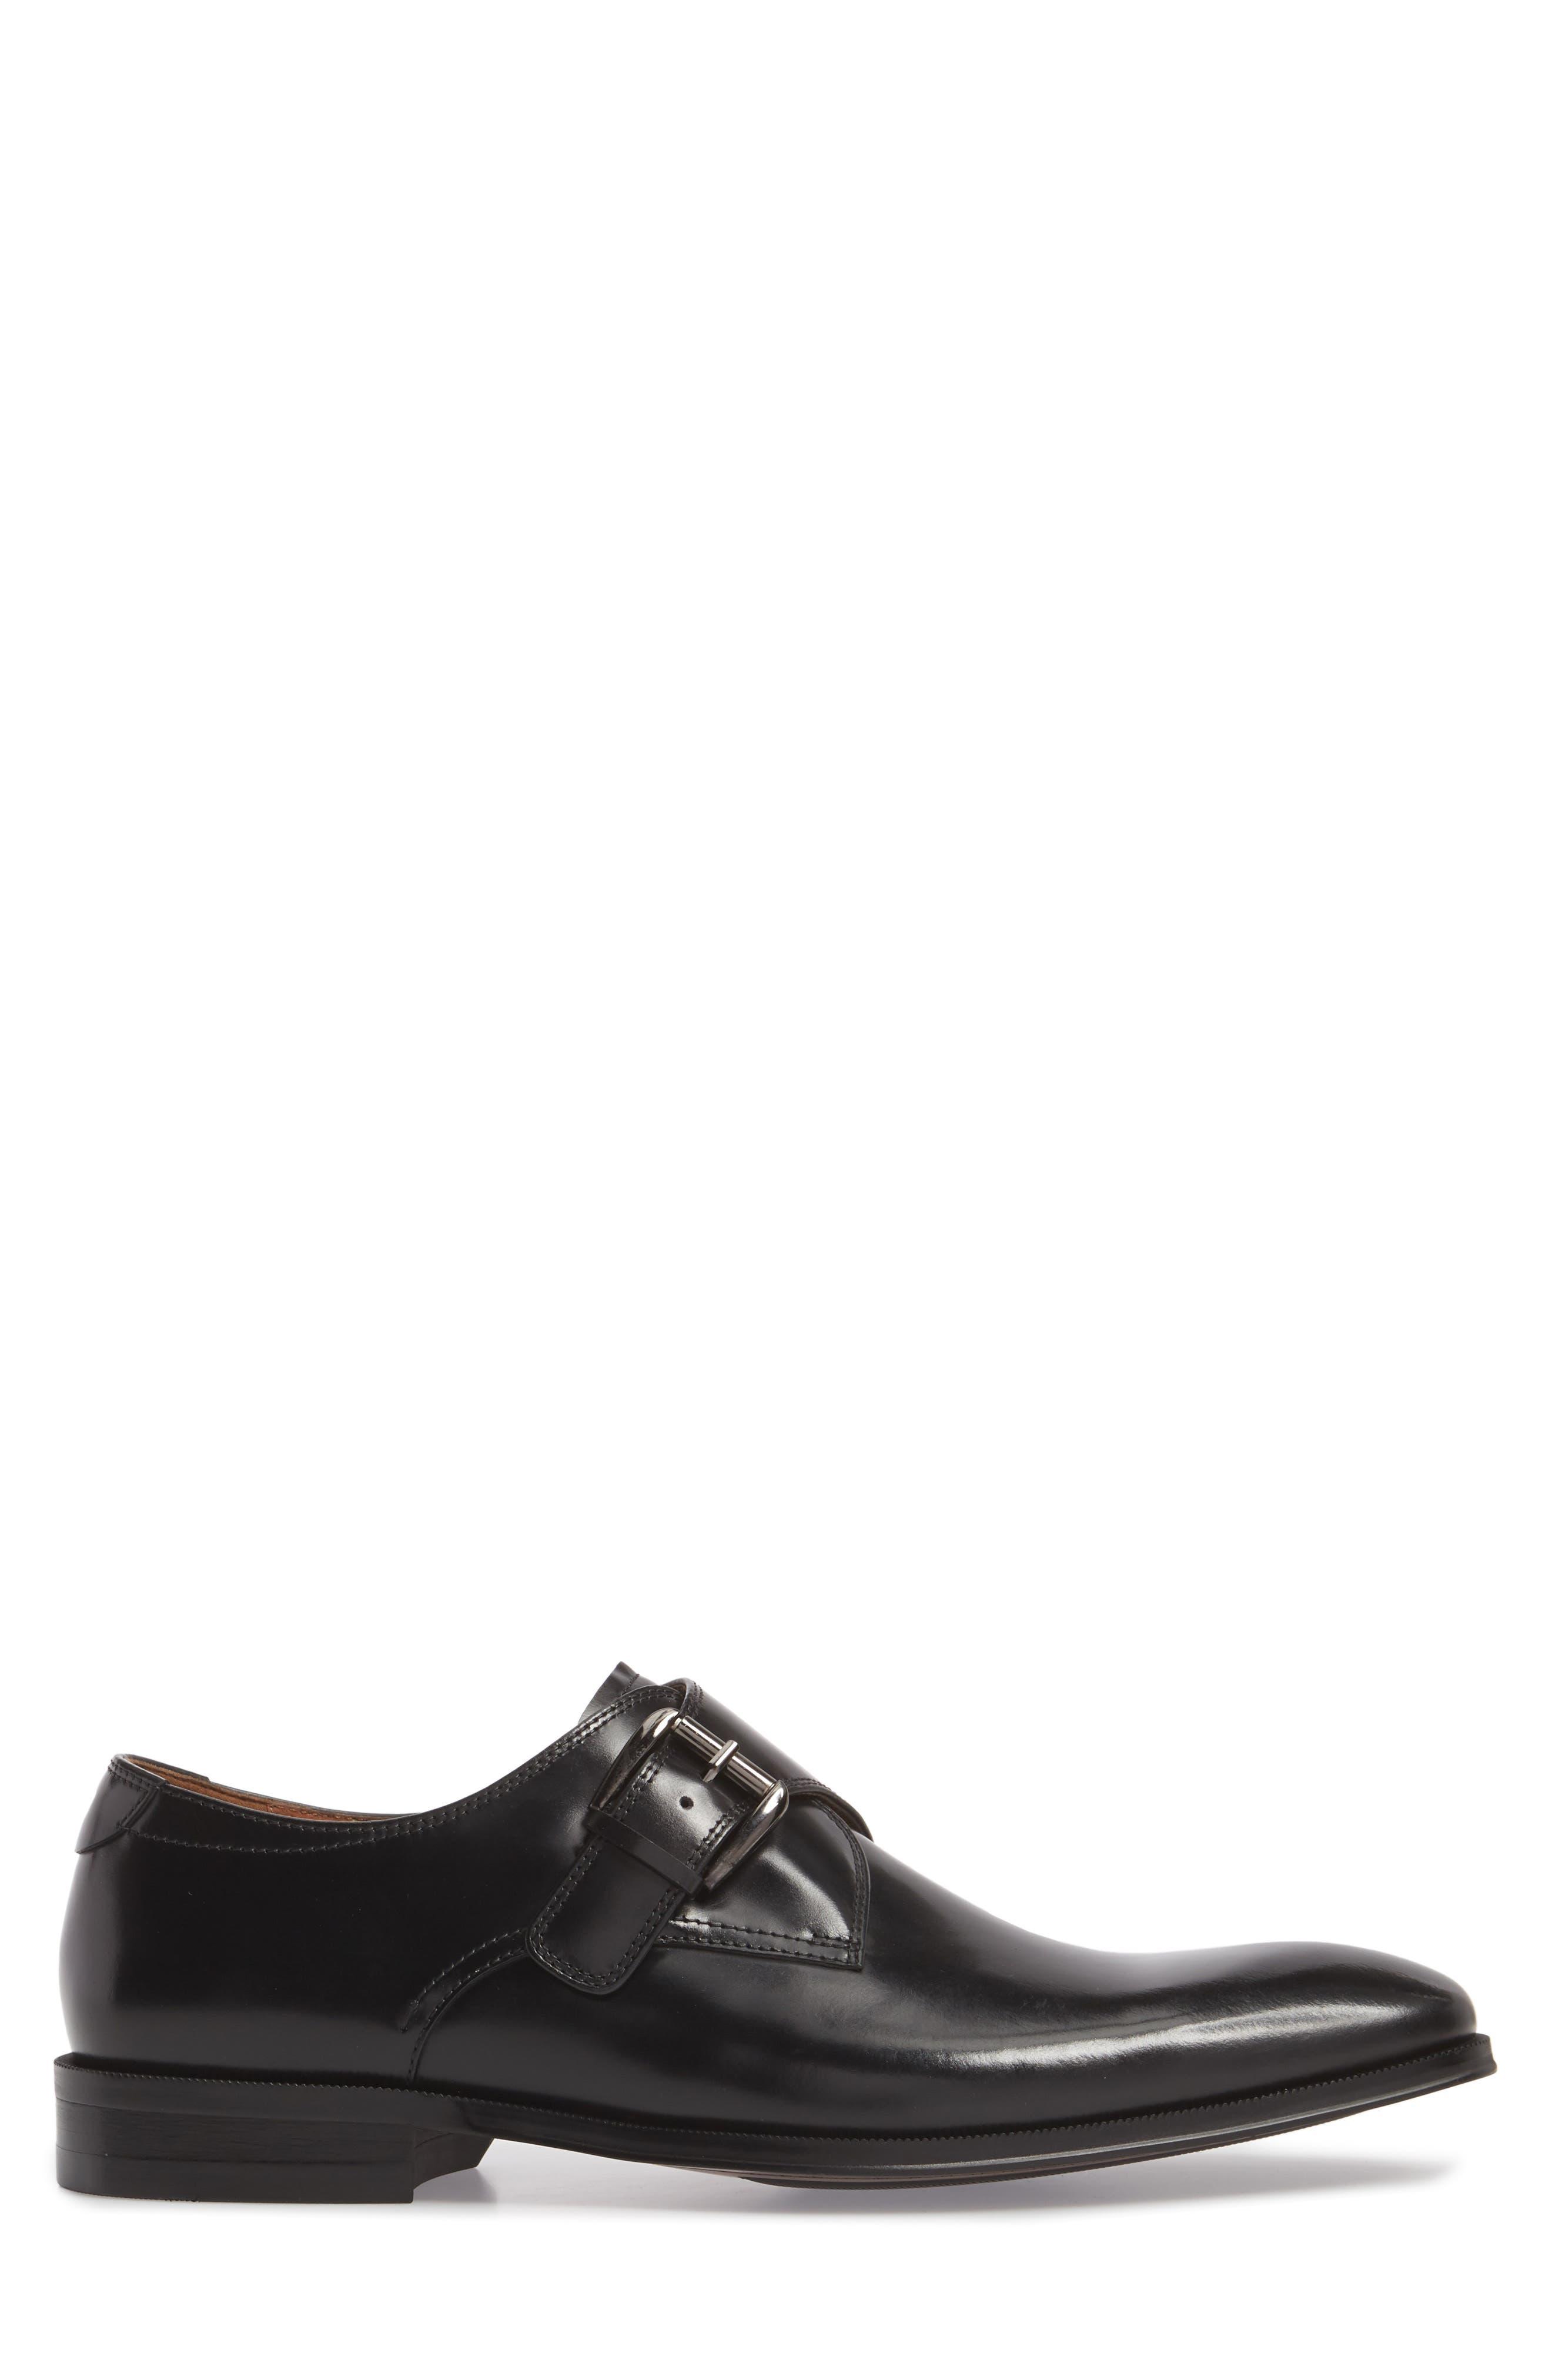 FLORSHEIM, Belfast Single Strap Monk Shoe, Alternate thumbnail 3, color, BLACK LEATHER